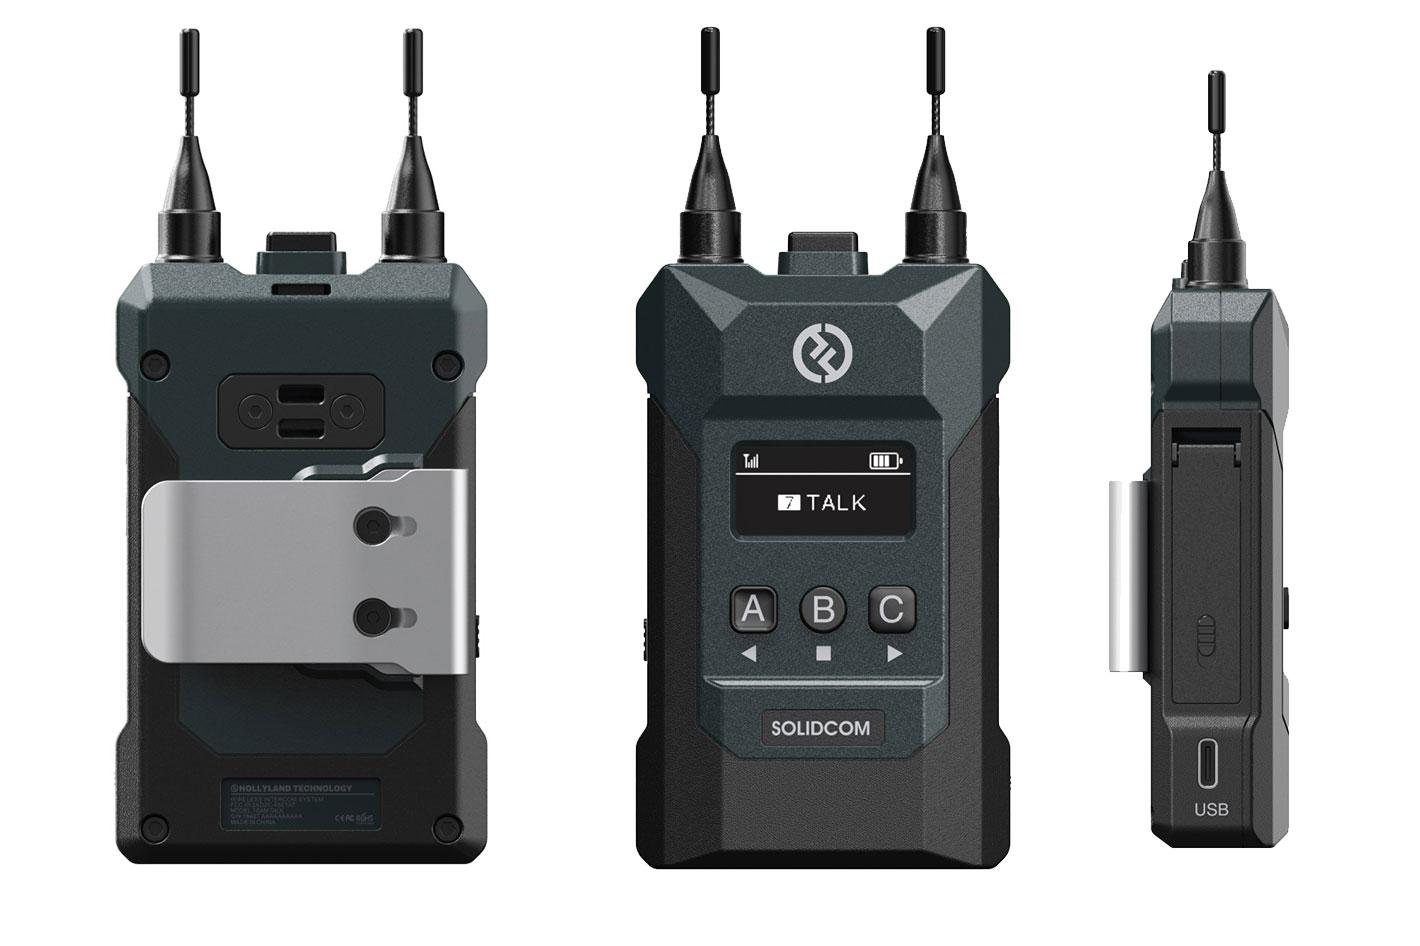 Hollyland Solidcom M1: wireless intercoms for teams